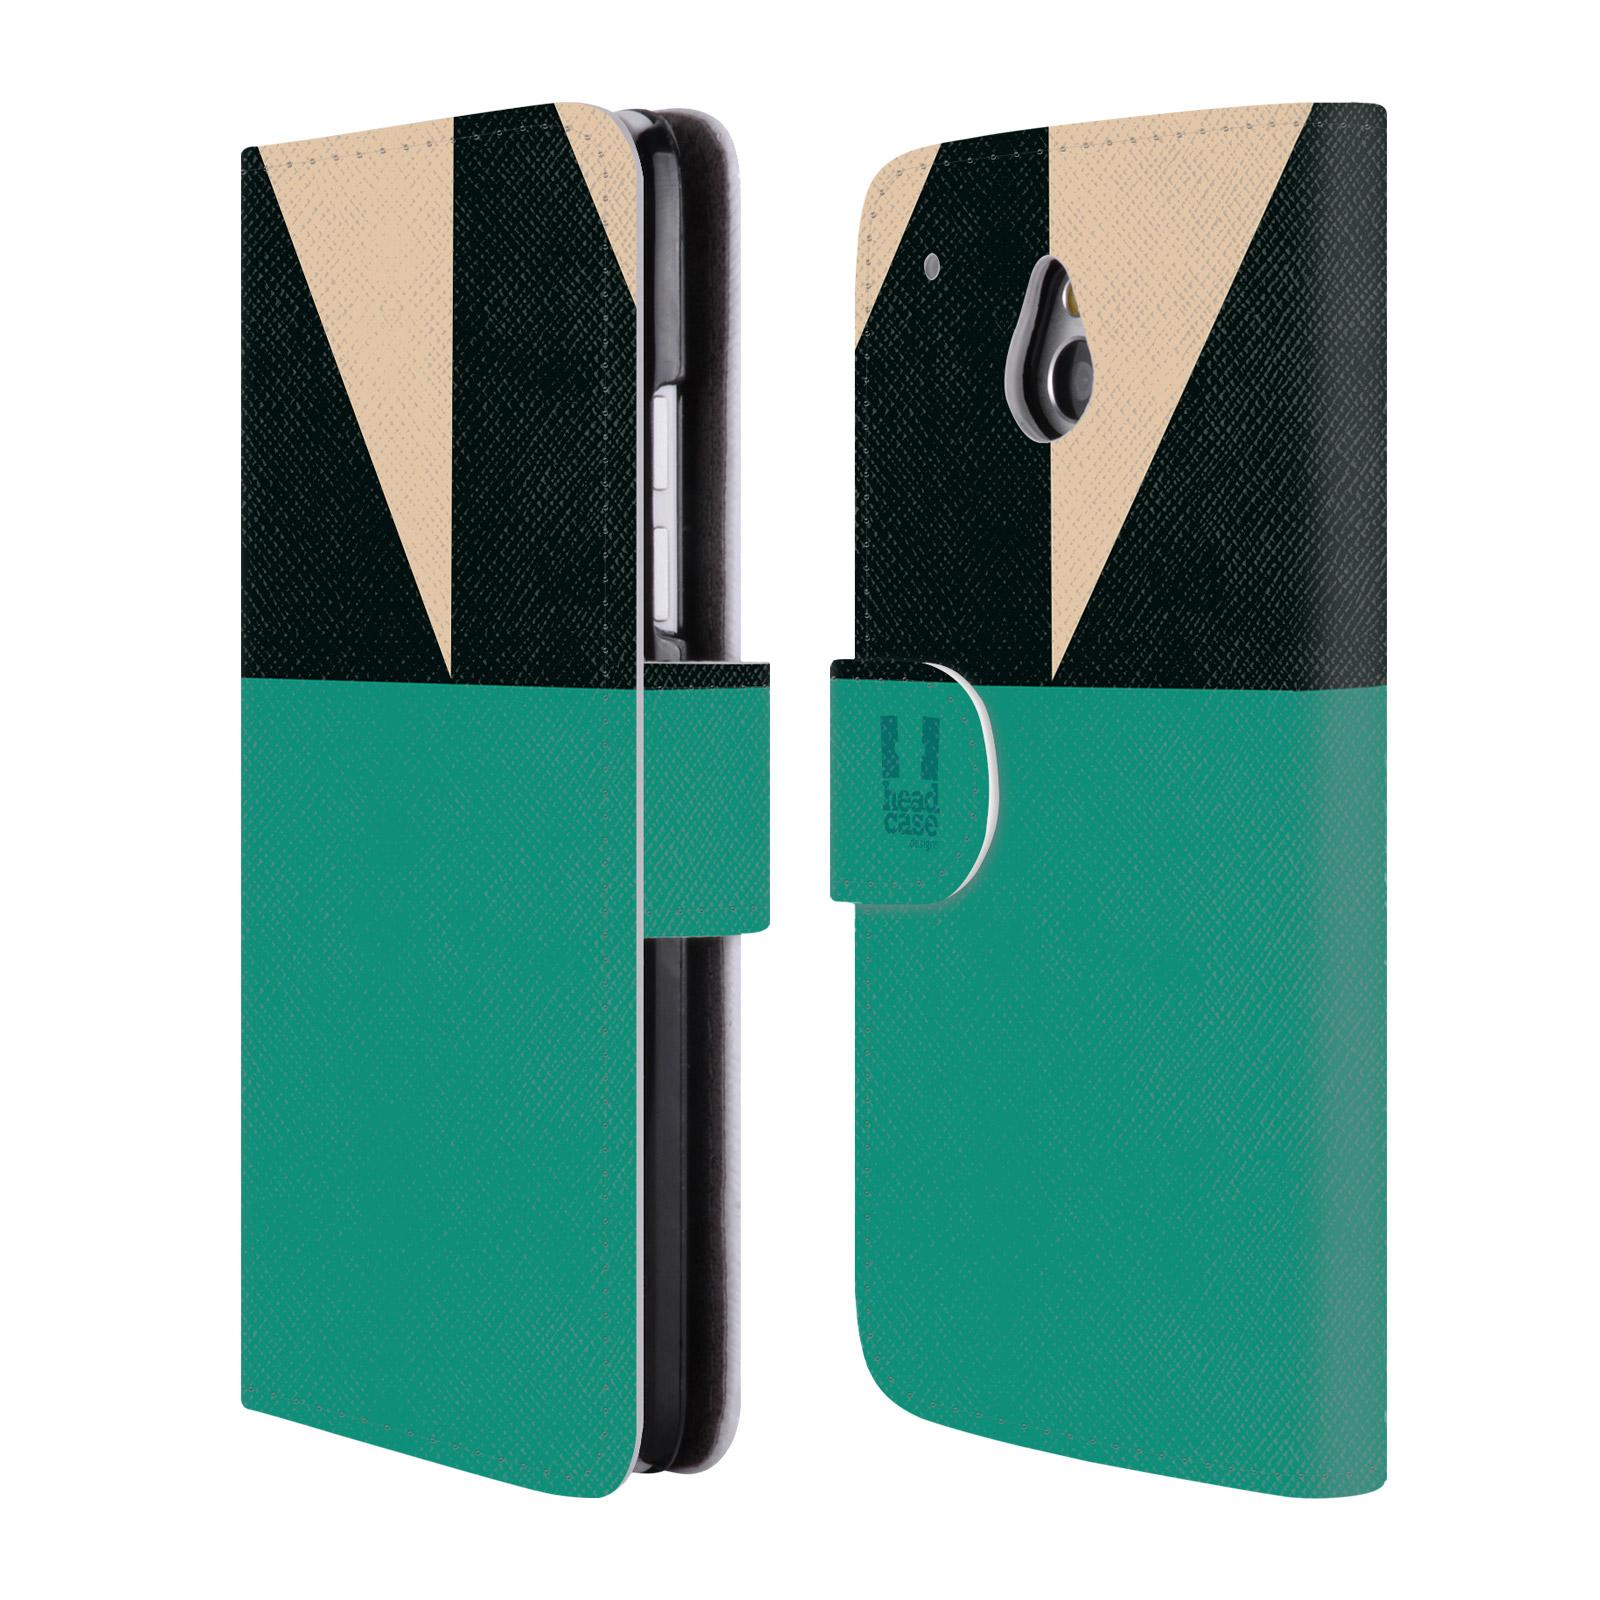 HEAD CASE Flipové pouzdro pro mobil HTC ONE MINI barevné tvary moře modrá